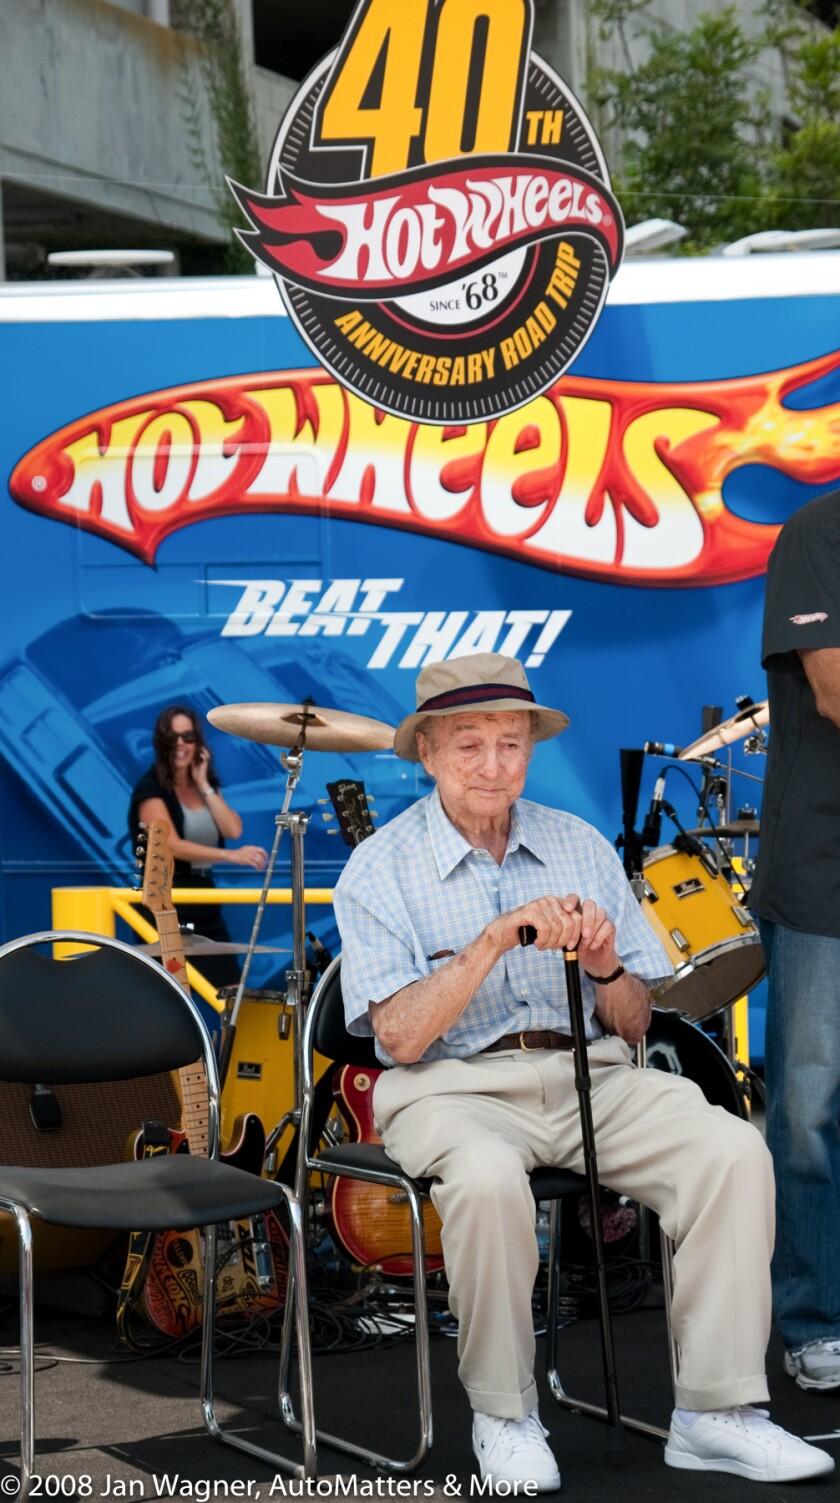 Hot Wheels creator Elliot Handler at the 40th Anniversary celebration